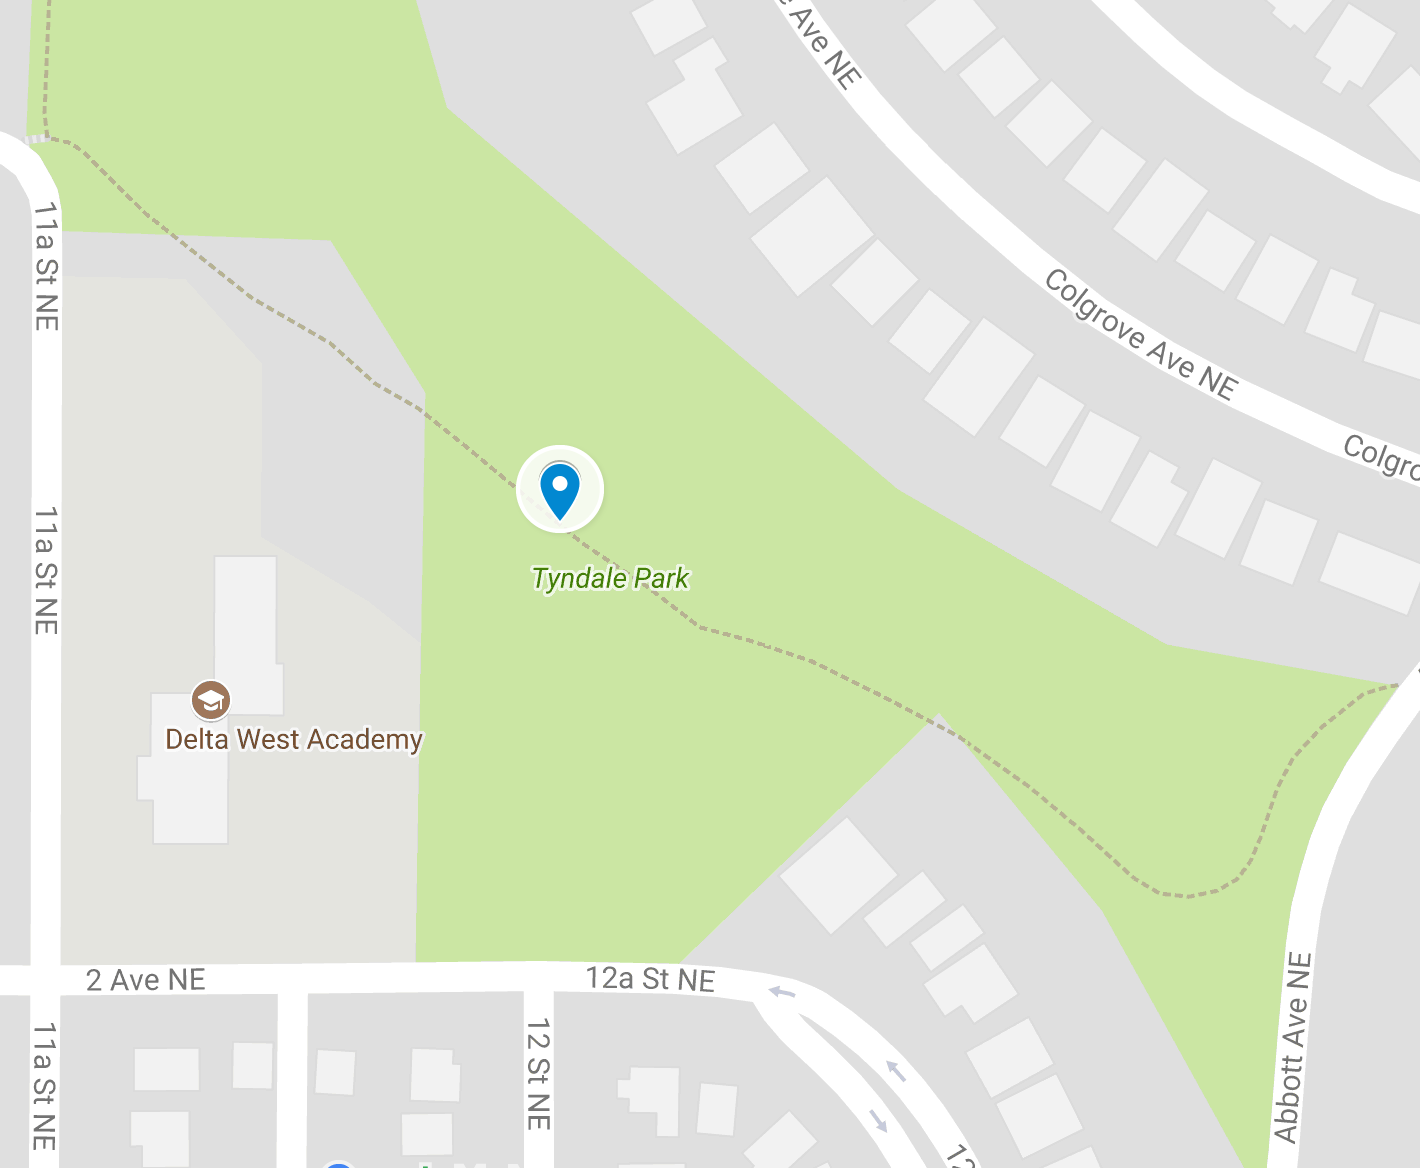 Tyndale Park